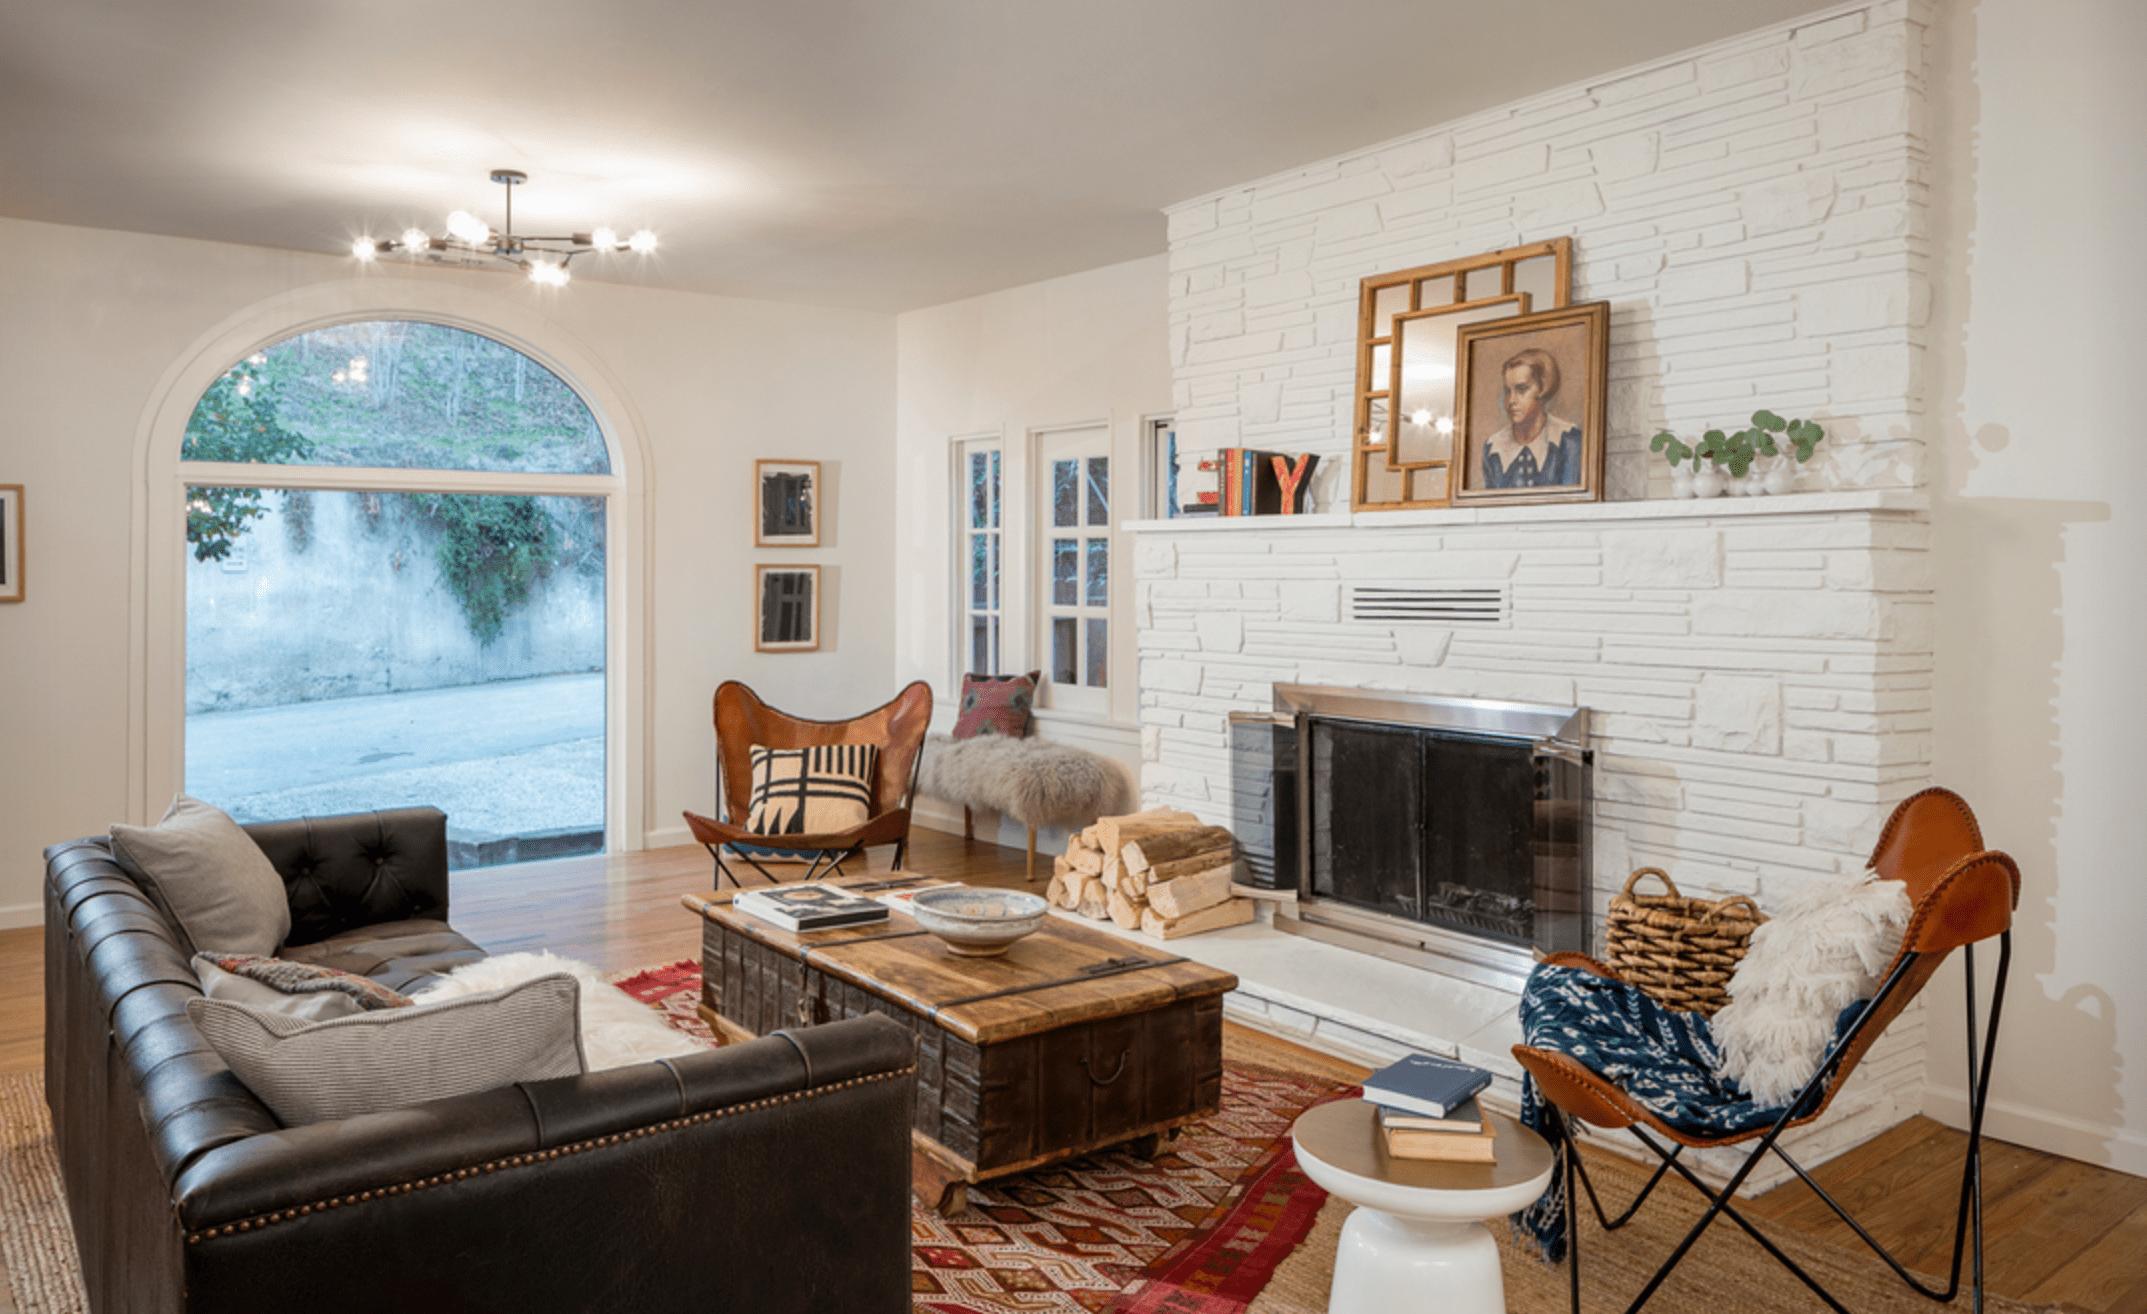 3623 Latrobe St., Los Angeles, CA 90031 Living Room 2